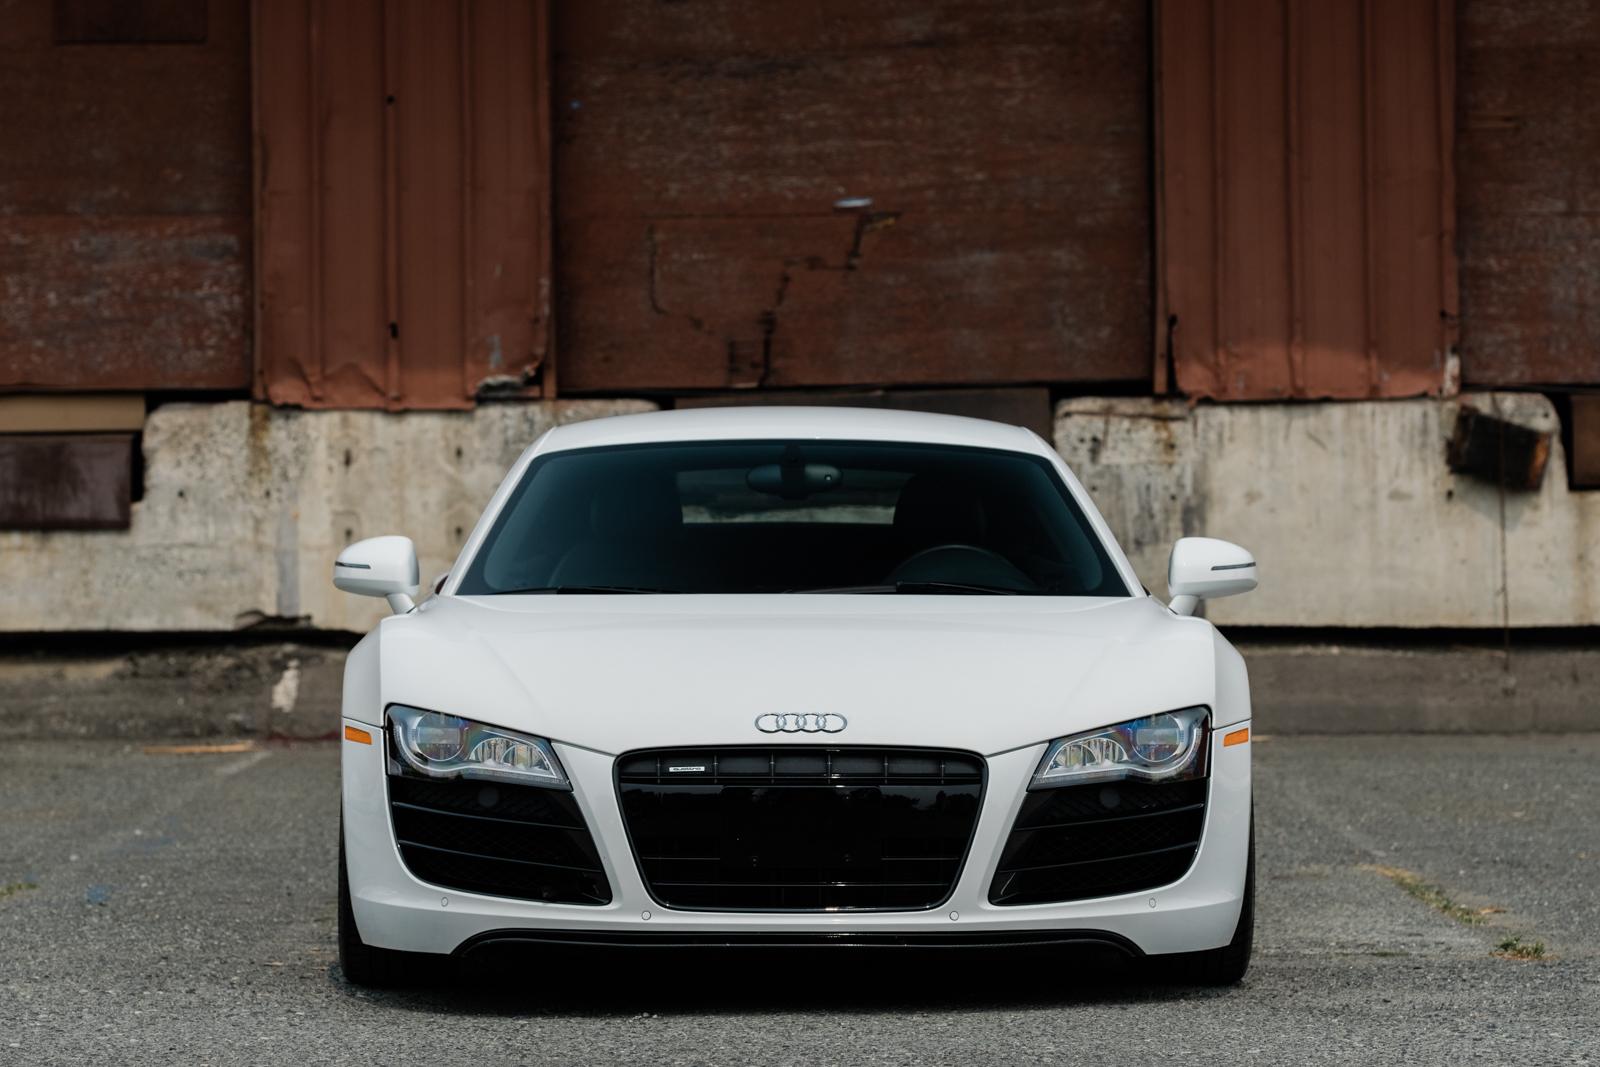 2011 Audi R8 V10 Coupe Silver Arrow Cars Ltd